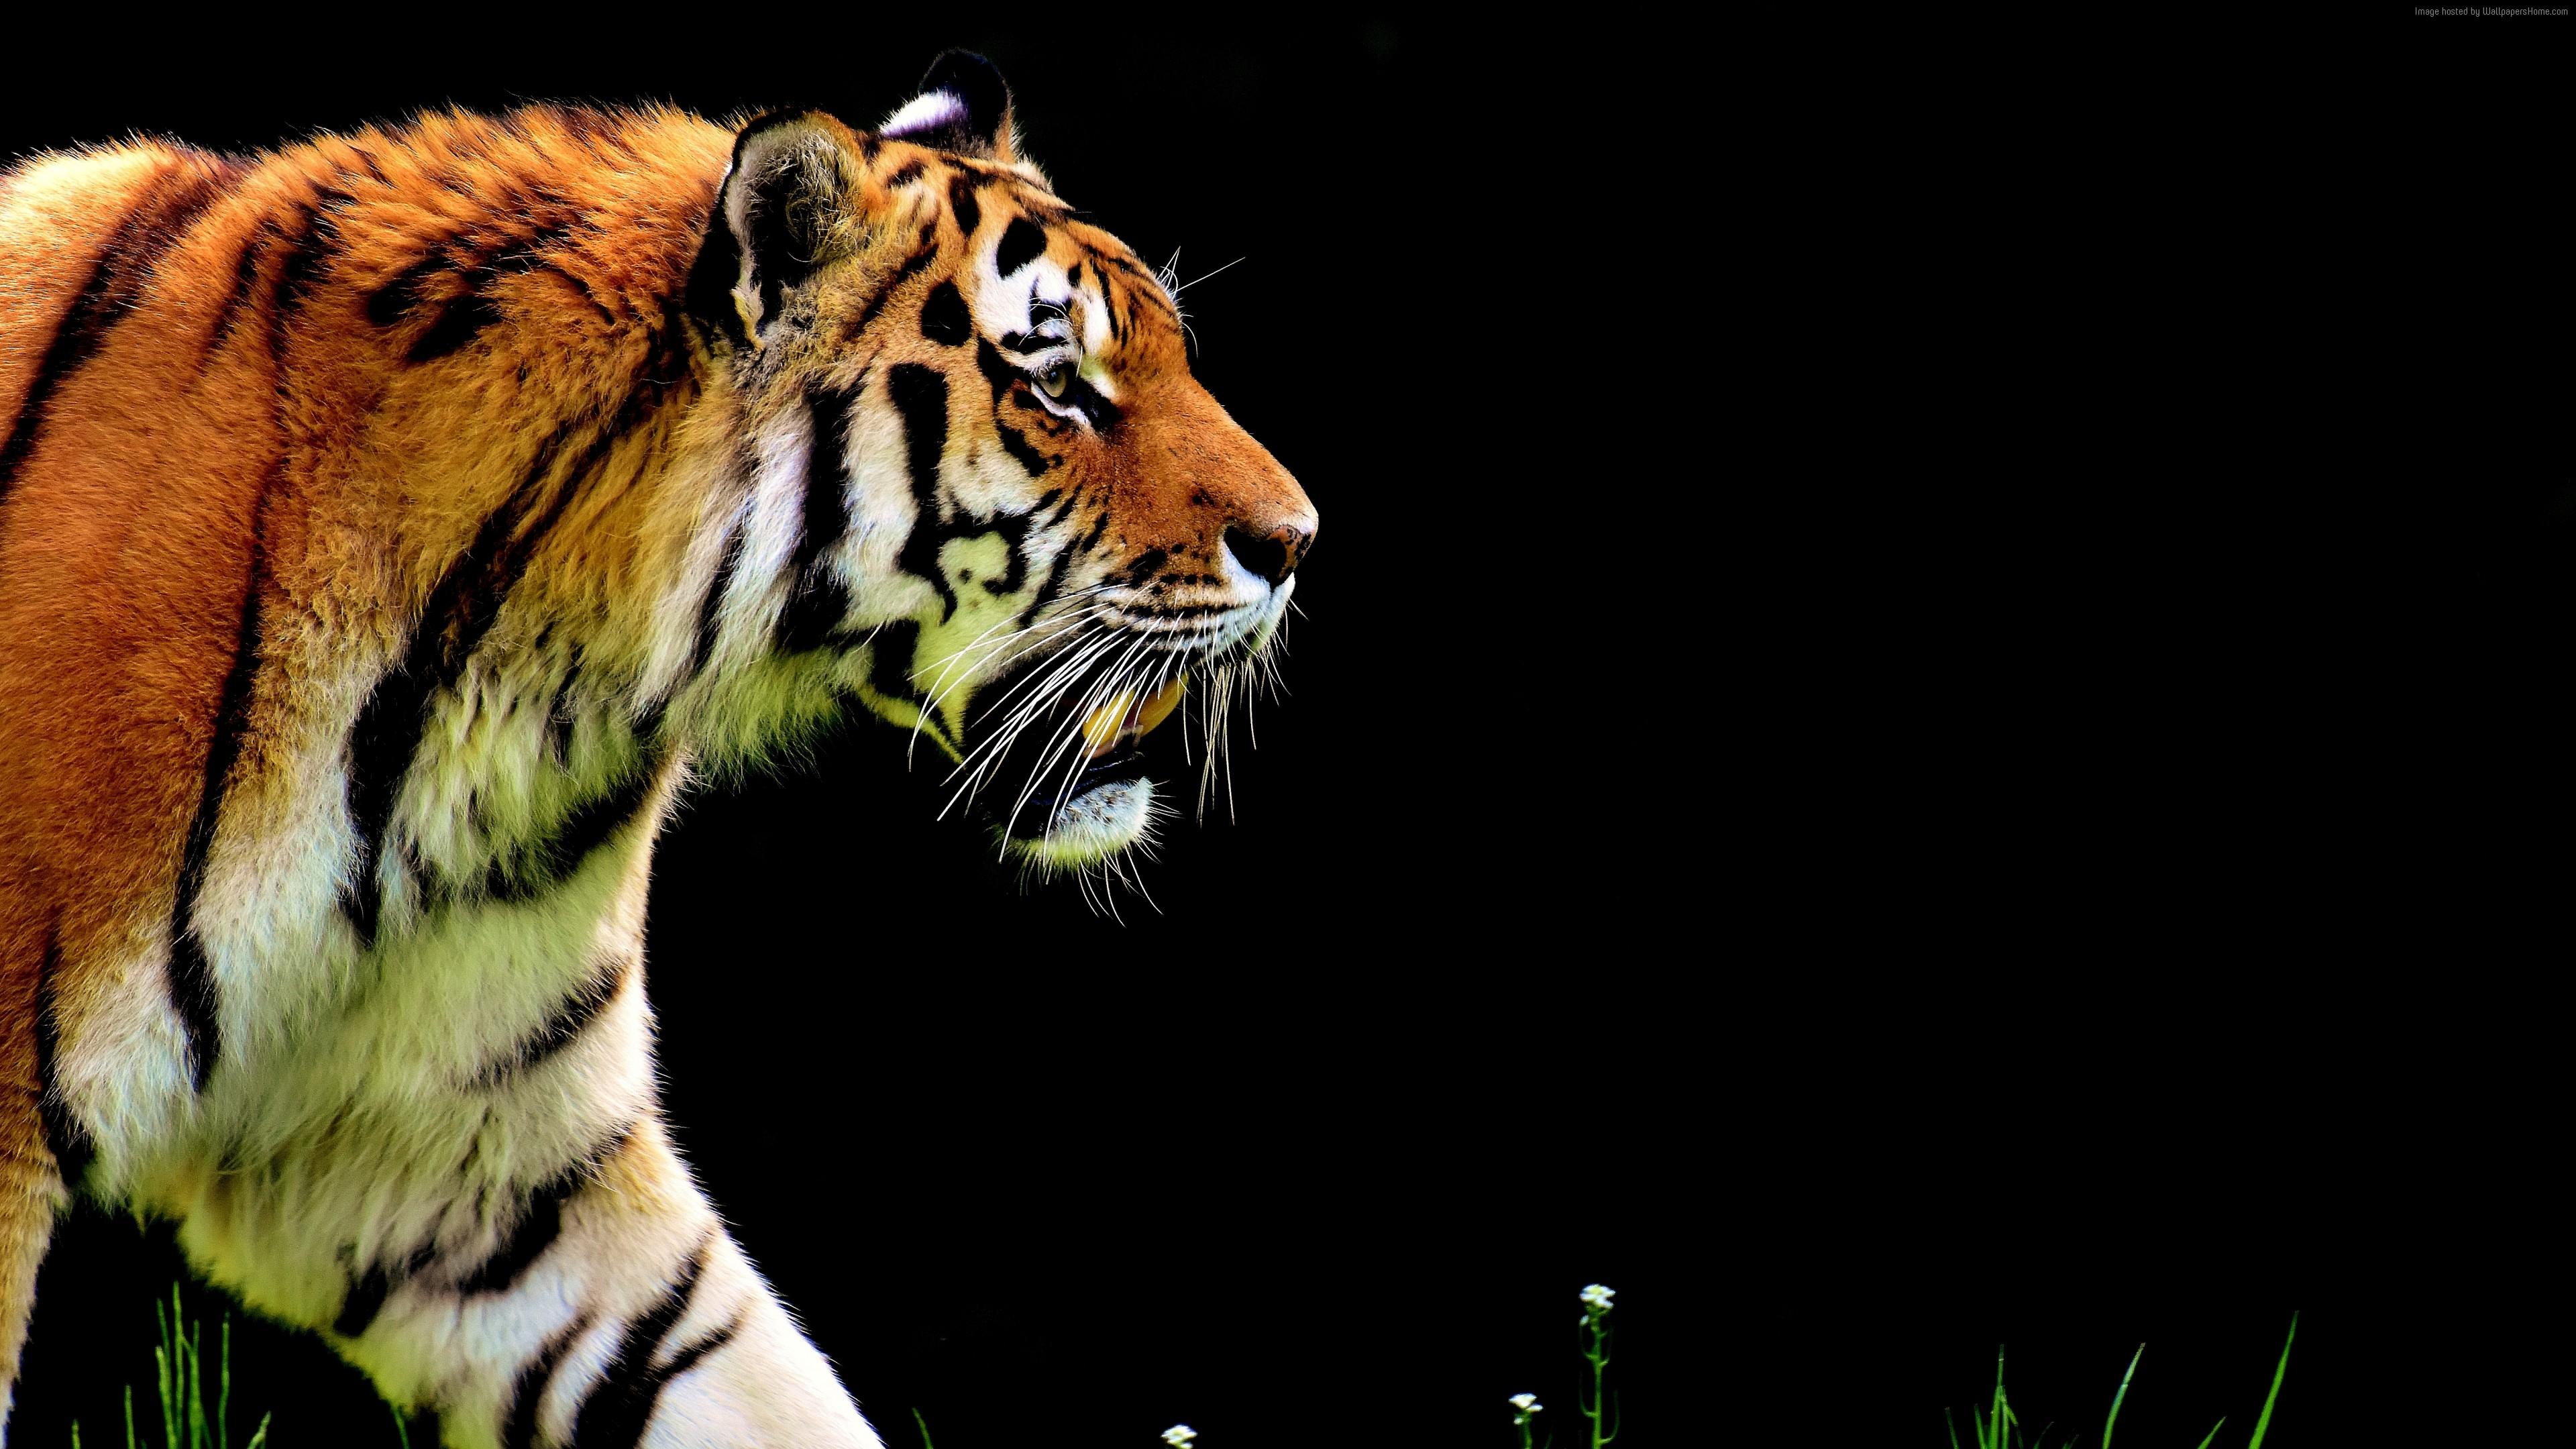 wallpaper tiger, 4k, animals 4k, tiger wallpaper download - high